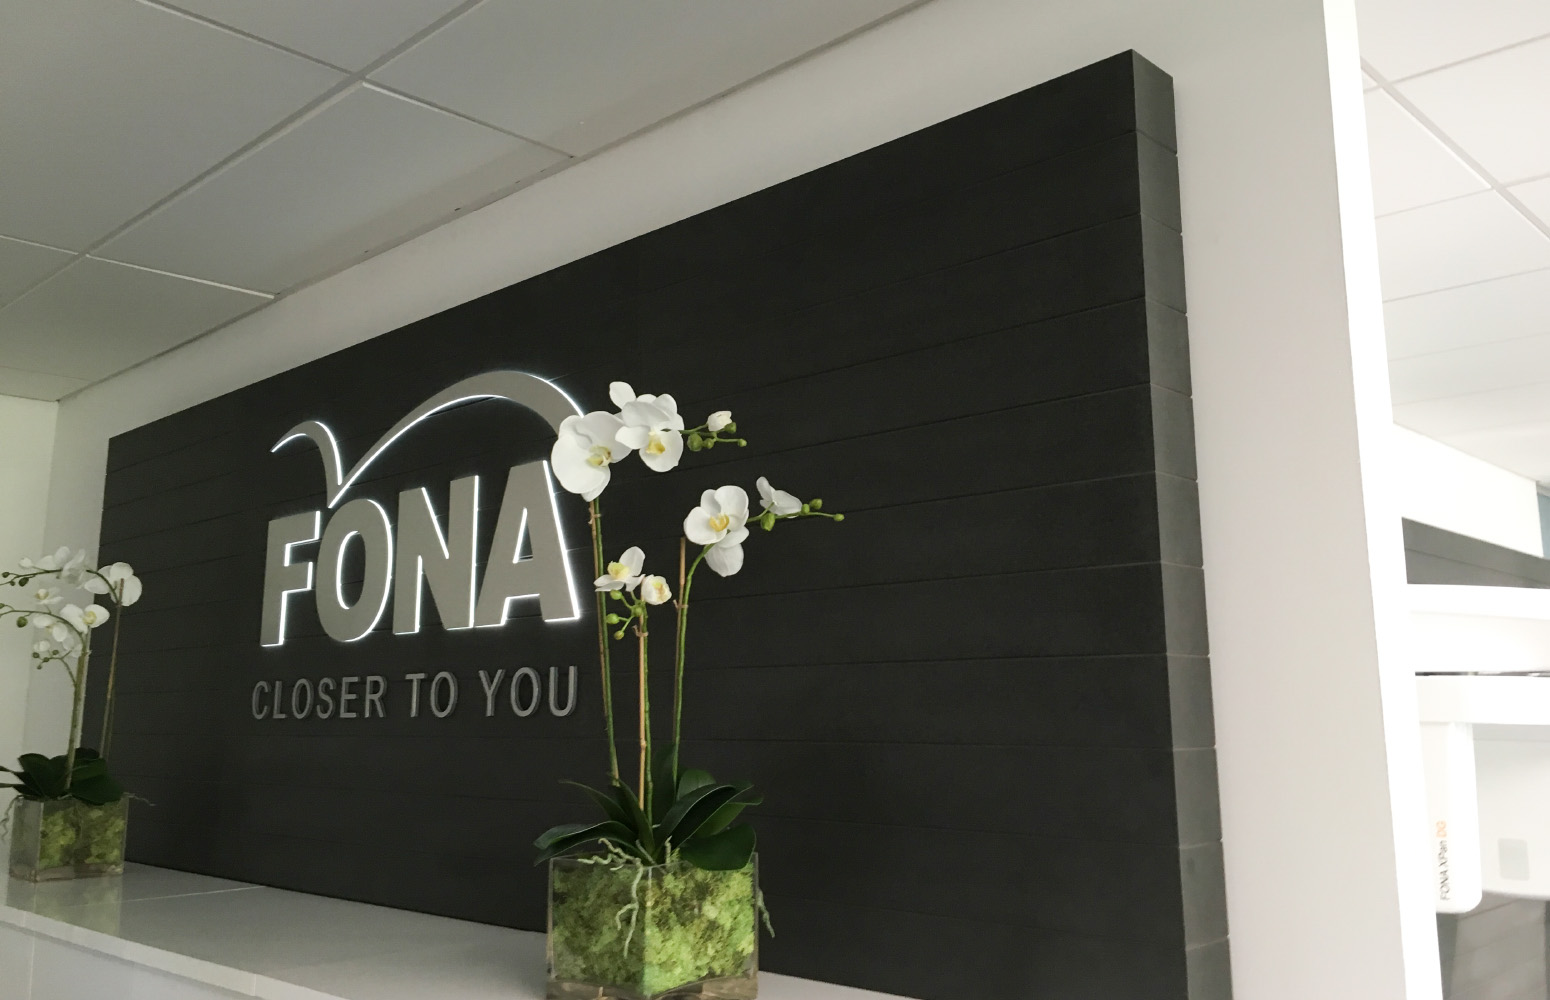 design-factory - Fona Dental